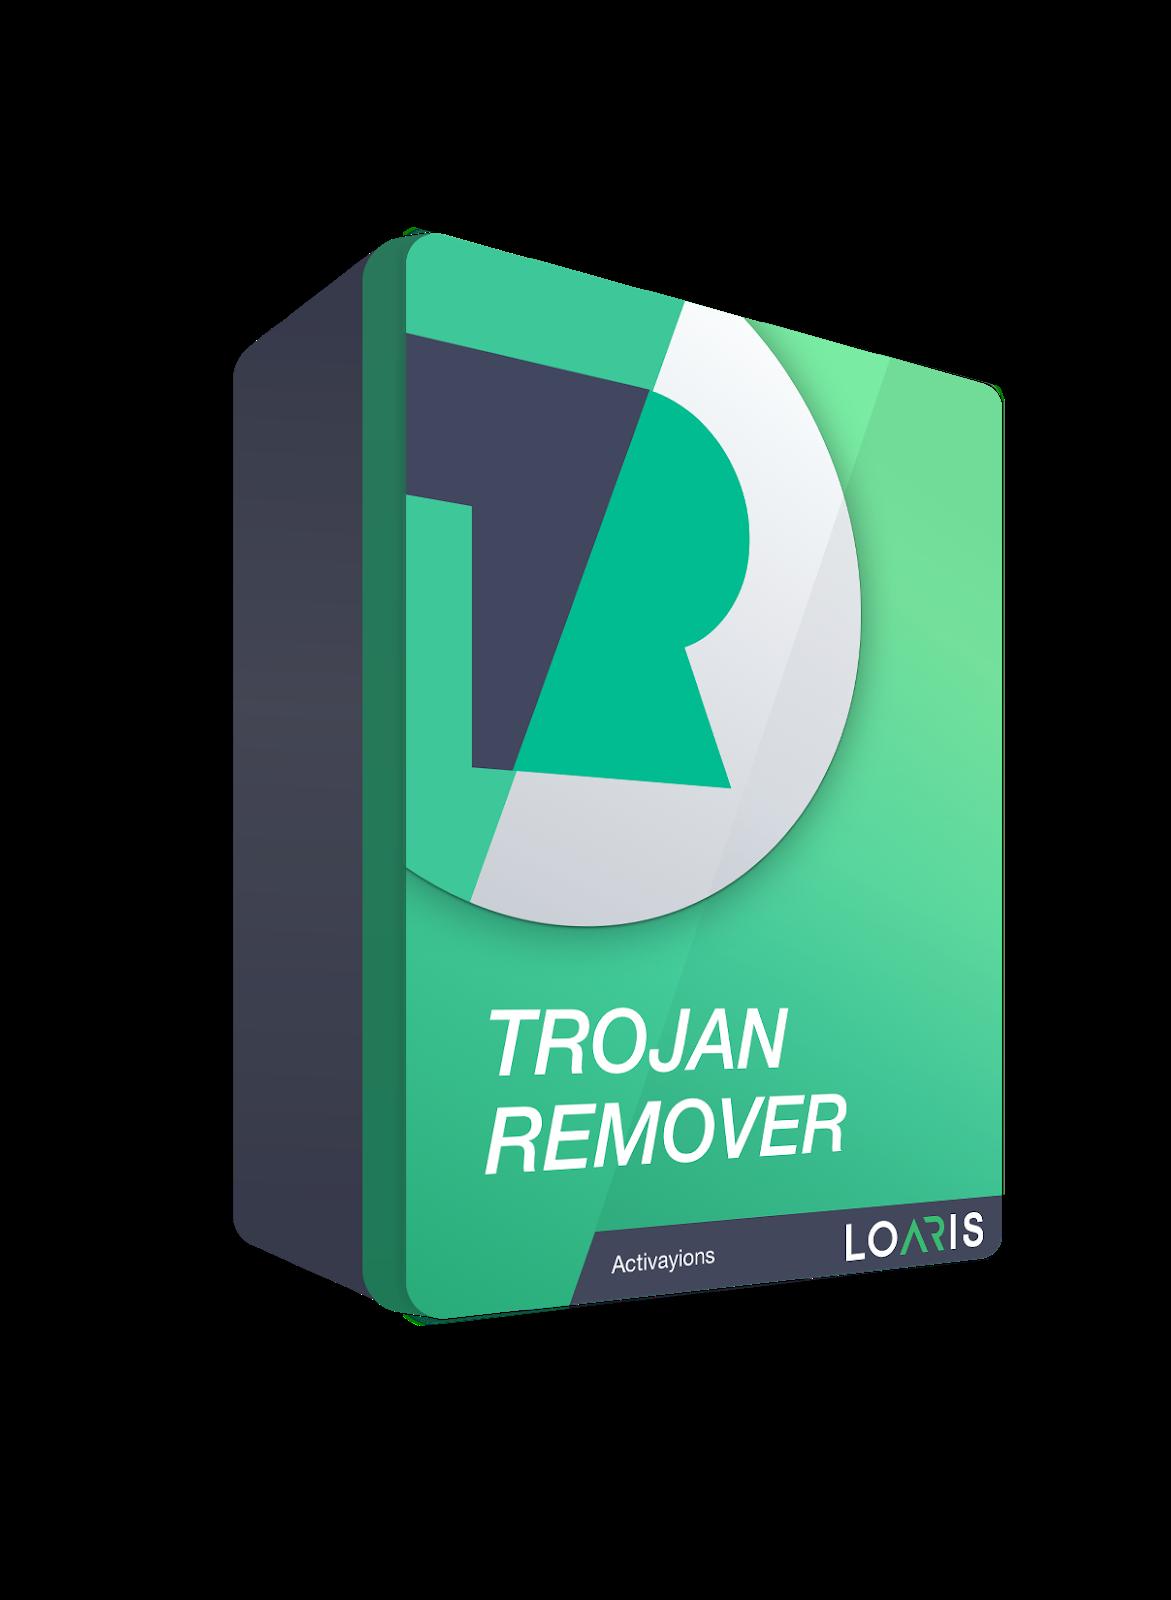 trojan remover crack download